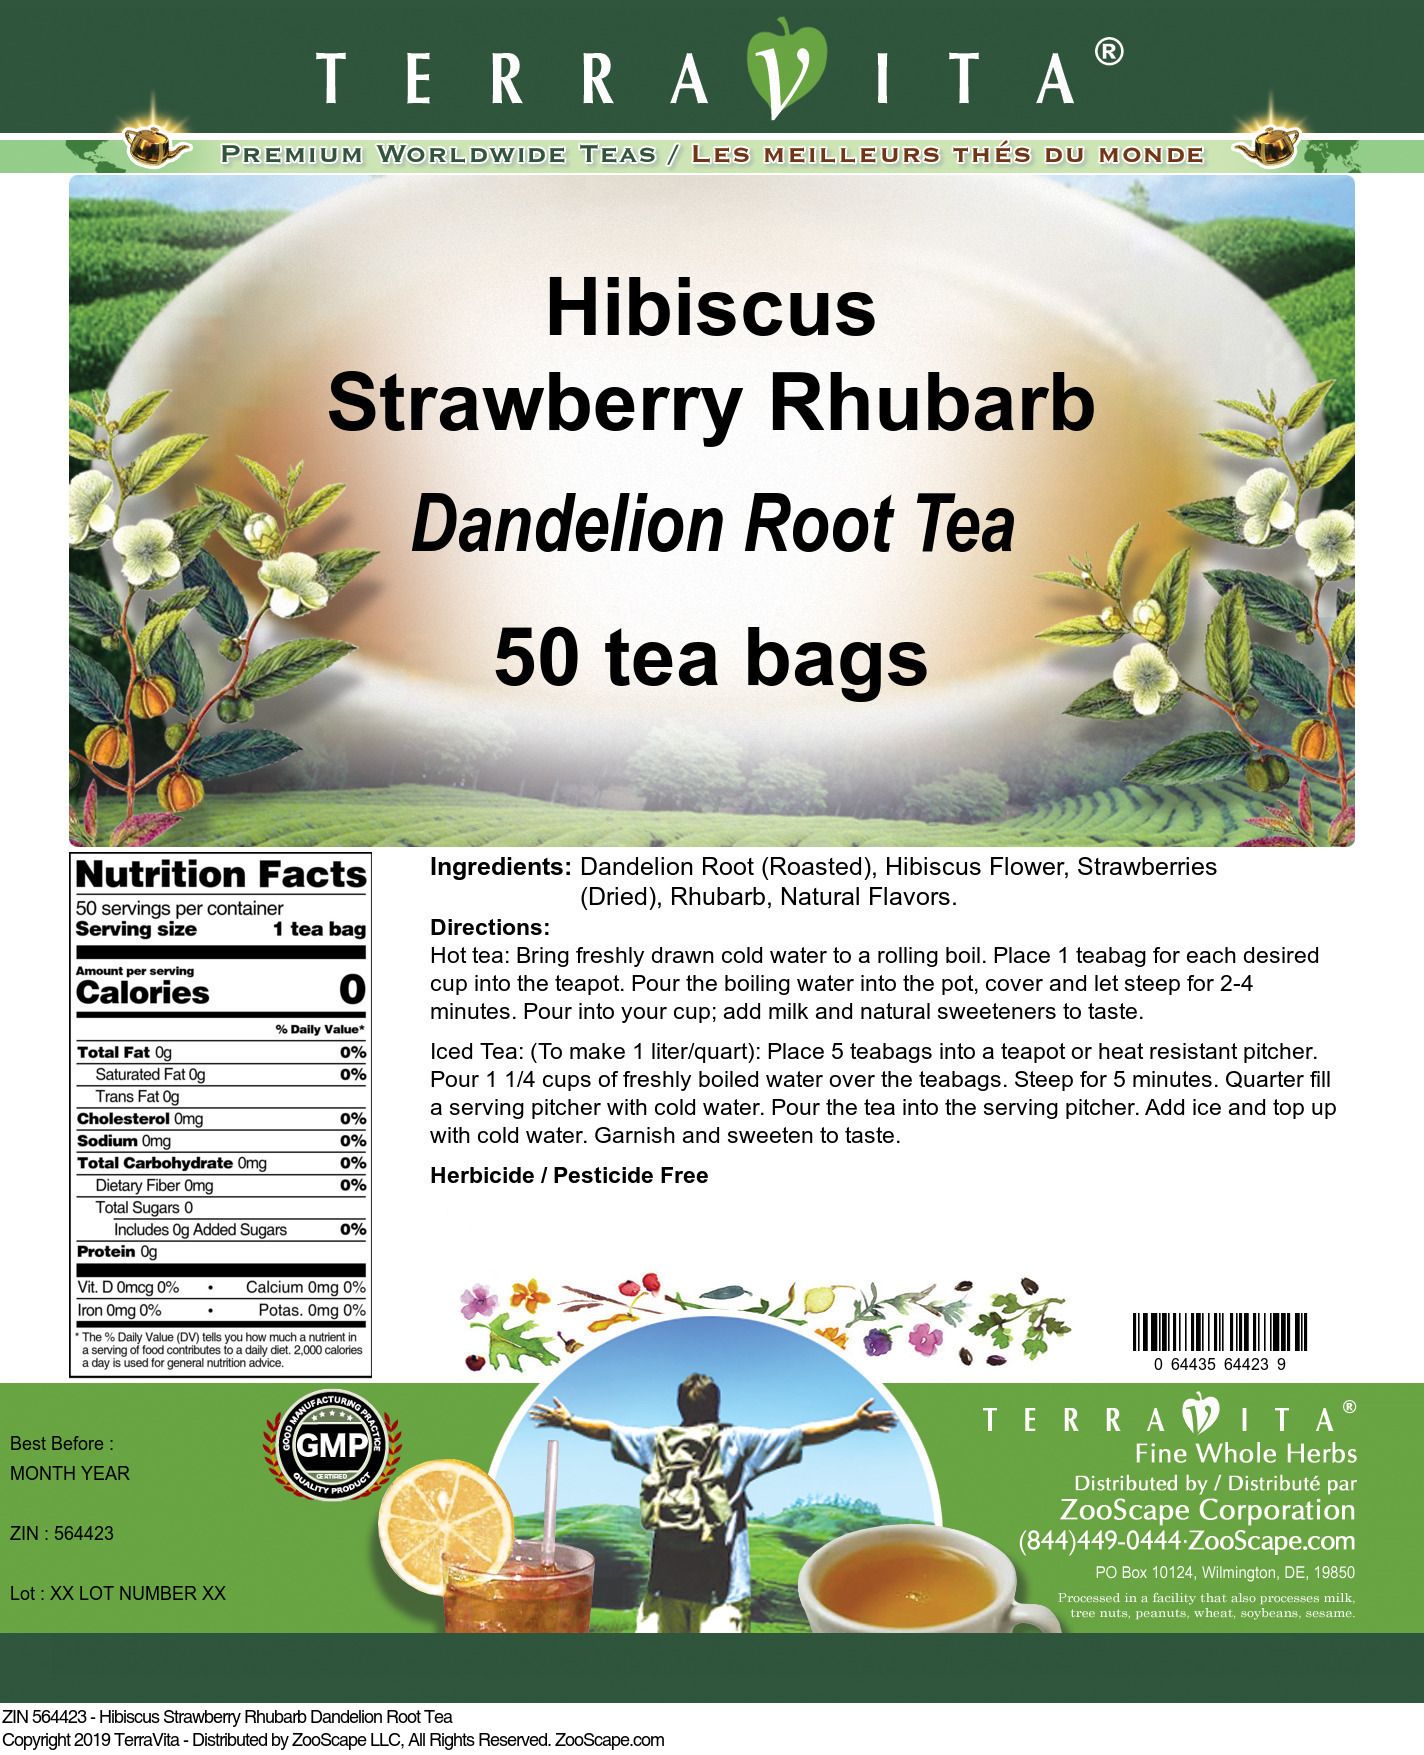 Hibiscus Strawberry Rhubarb Dandelion Root Tea